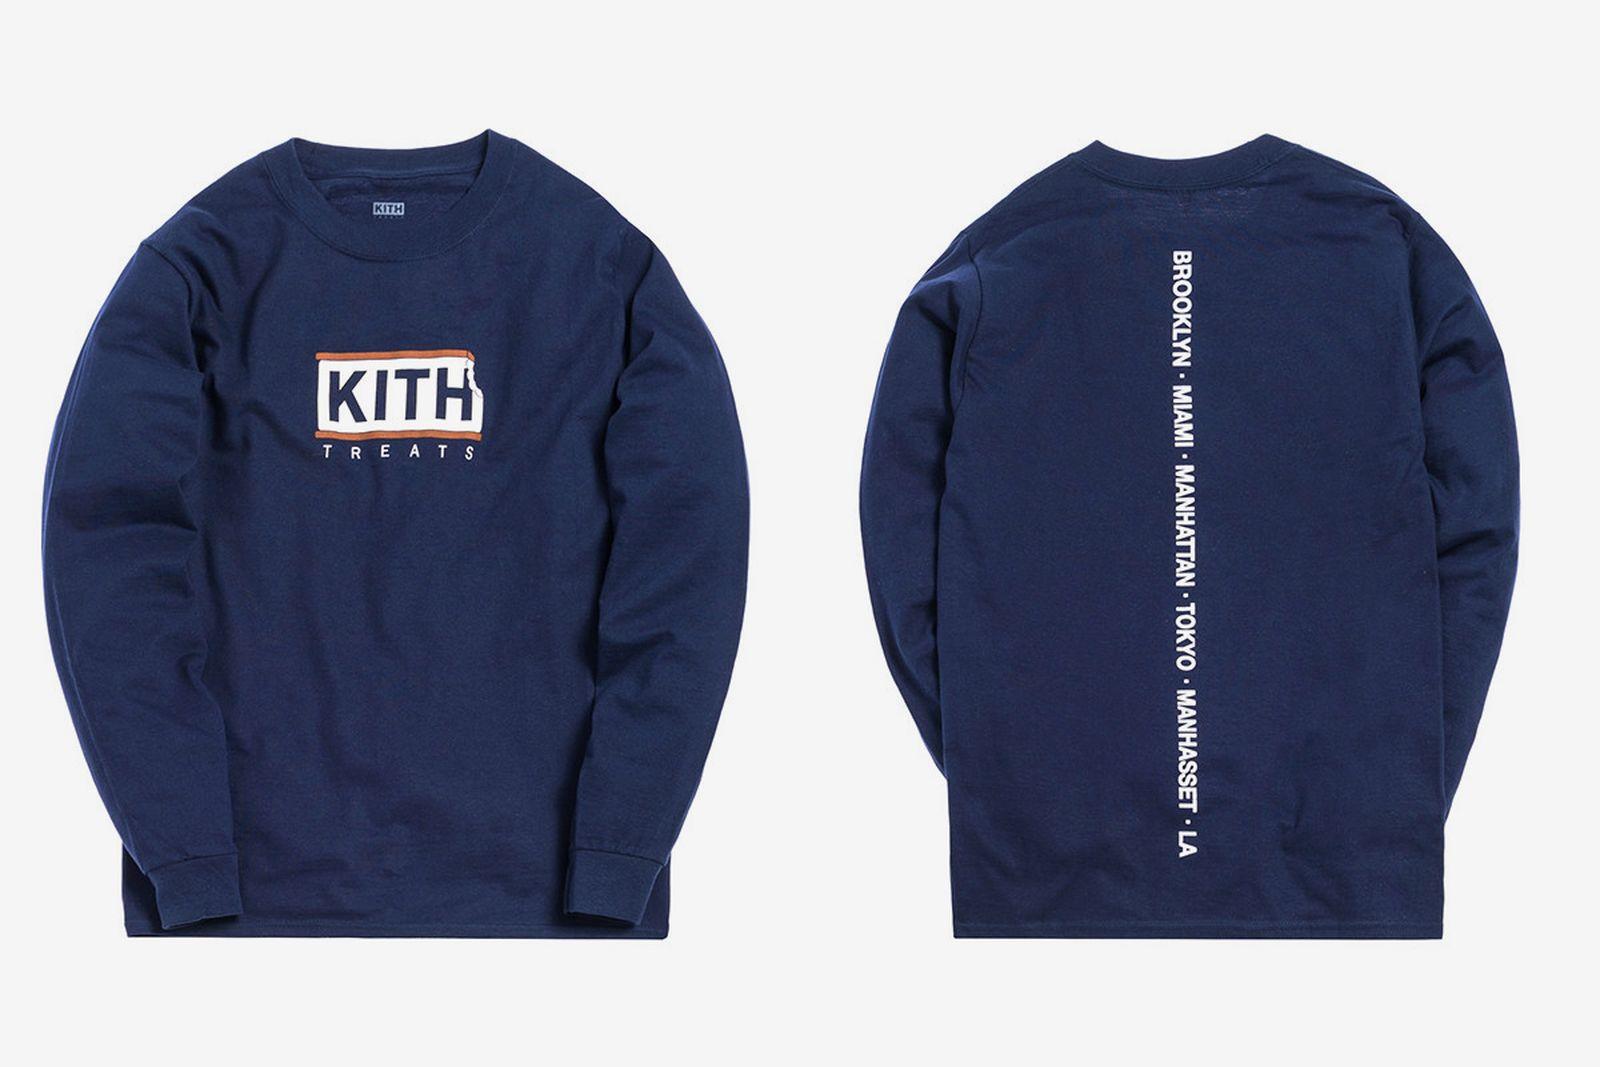 kith treats capsule collection ronnie fieg